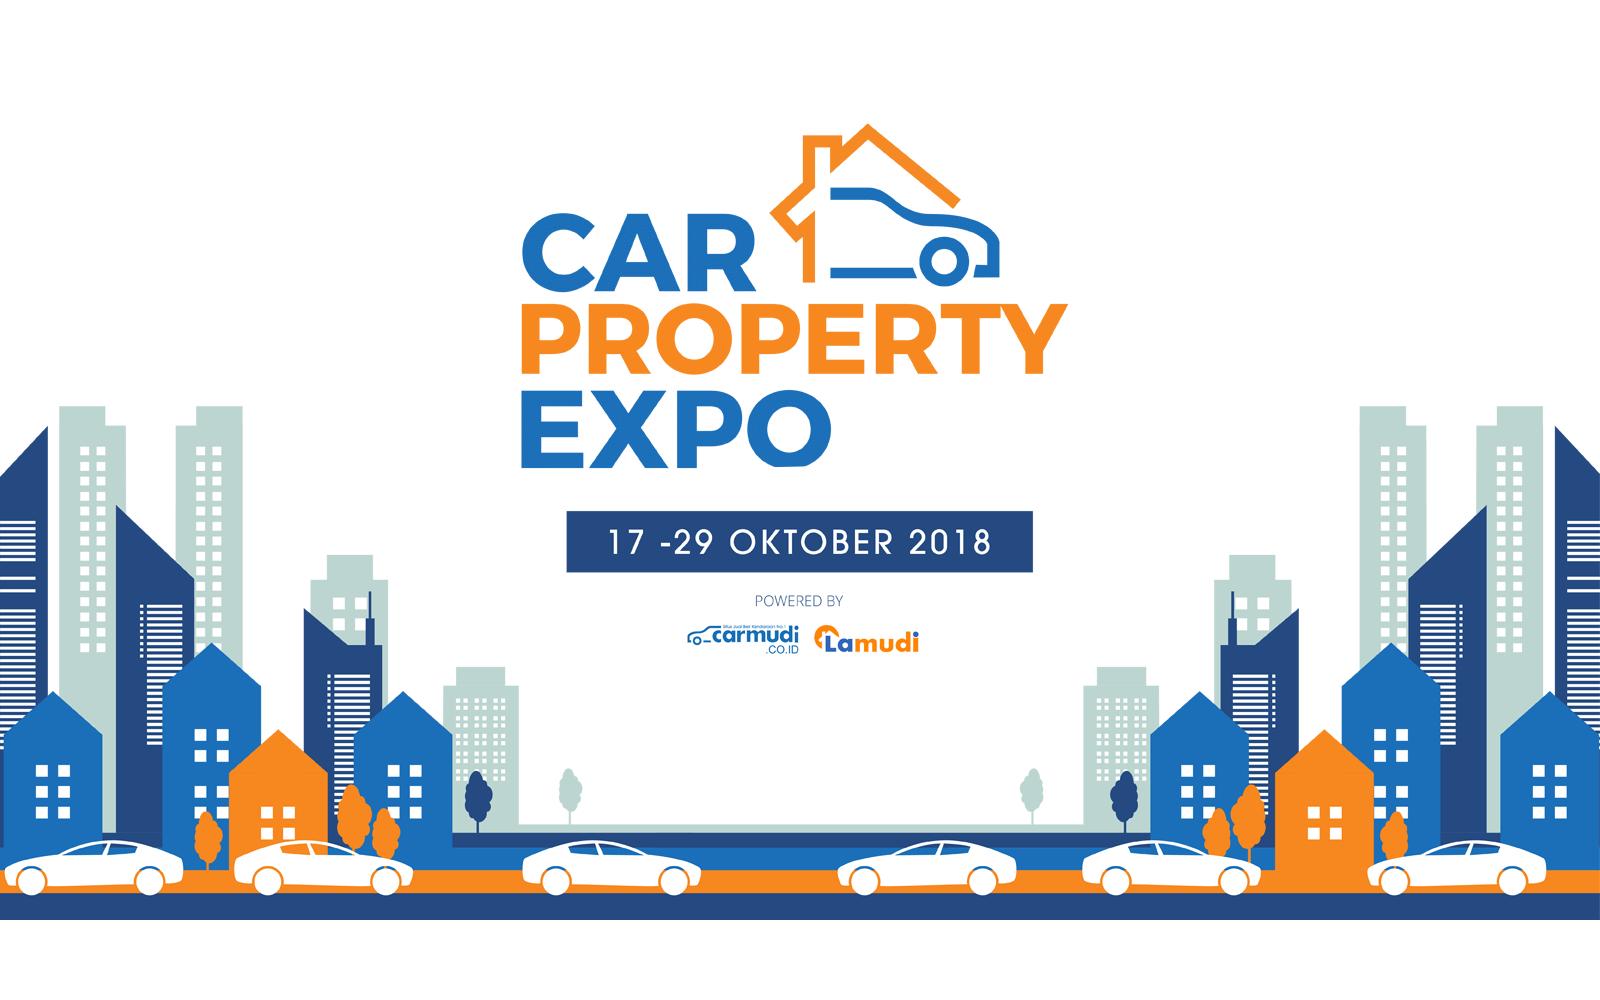 Car Property Expo